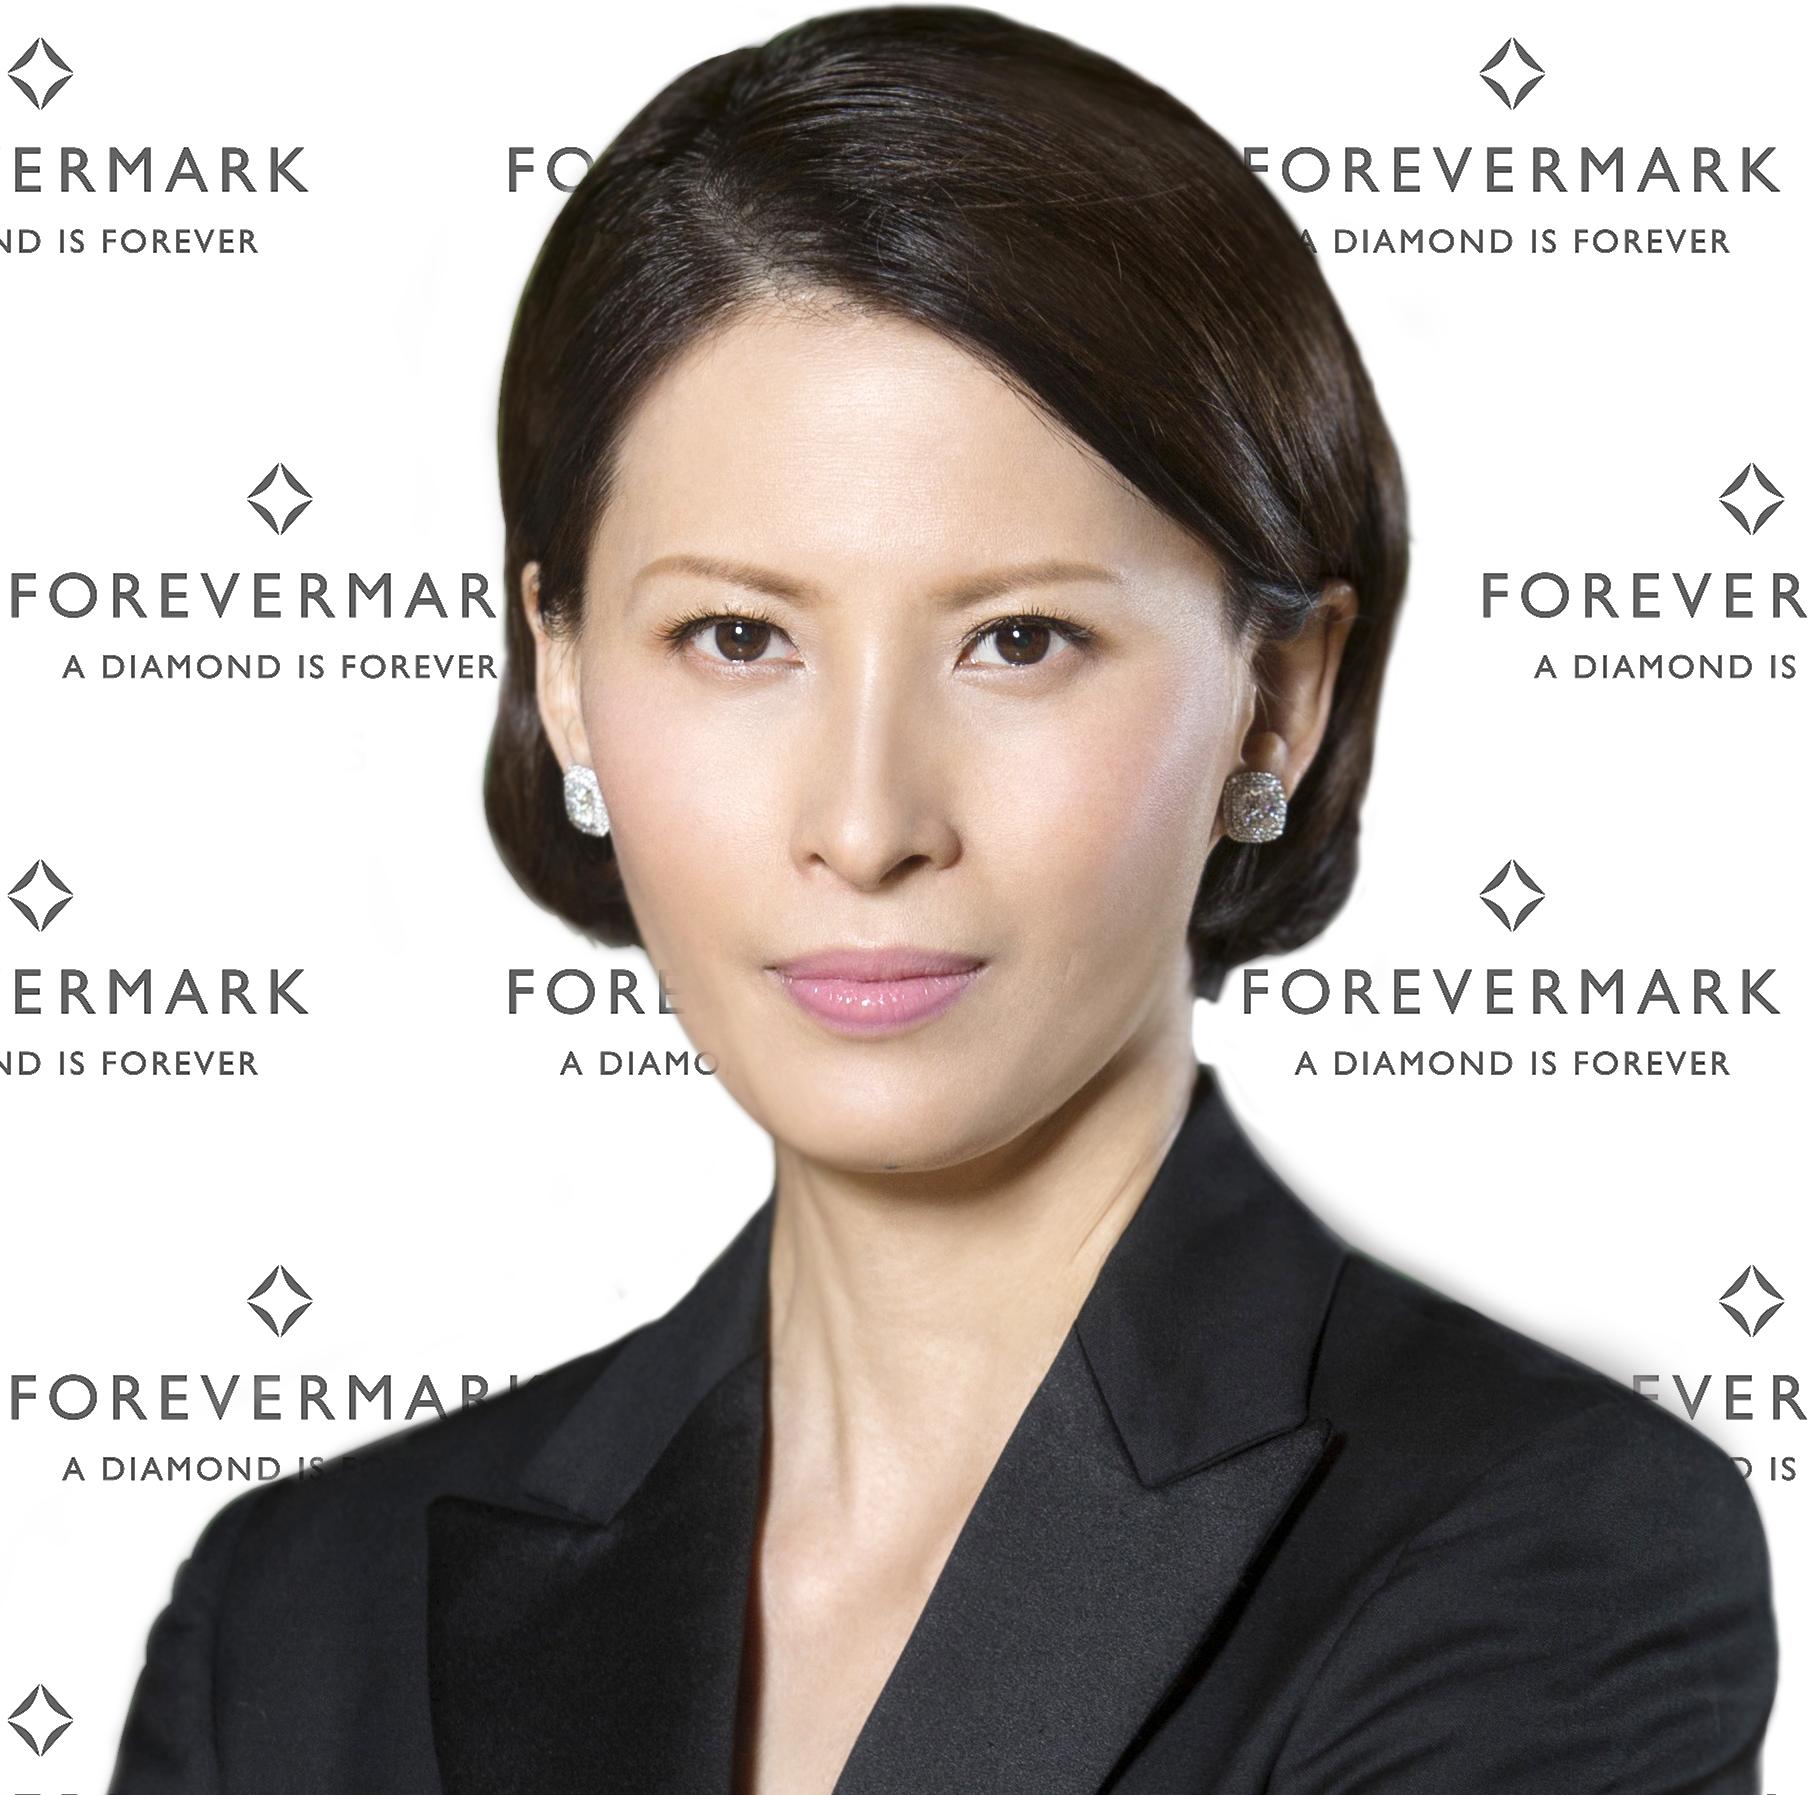 New Forevermark CEO Nancy Liu